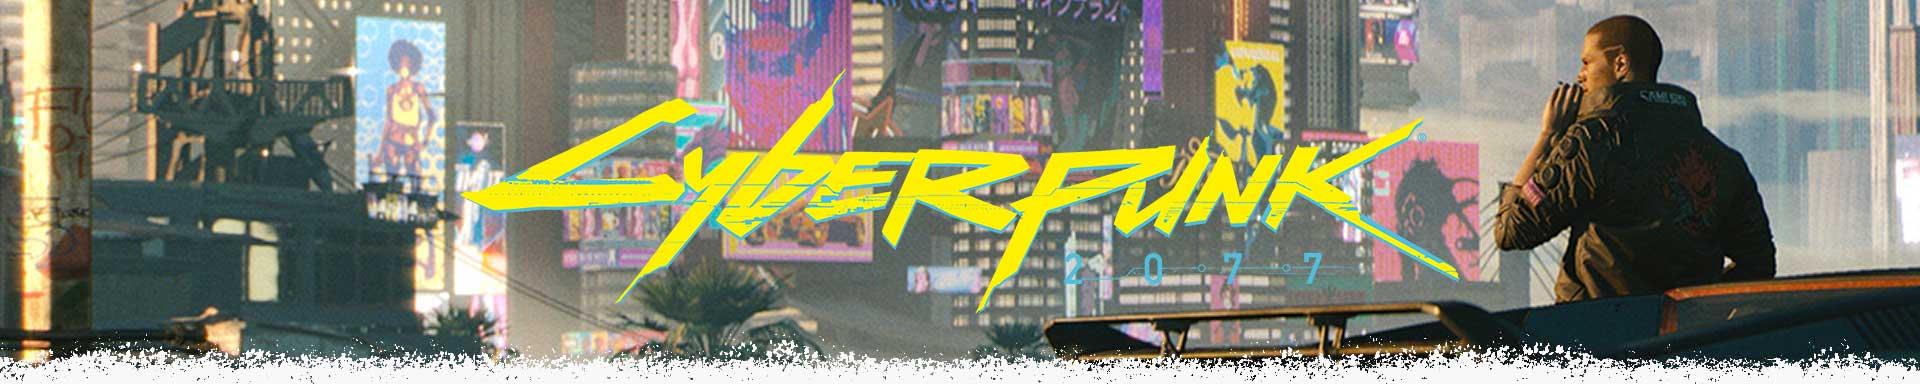 cyberpunk 2077 background kat 2021